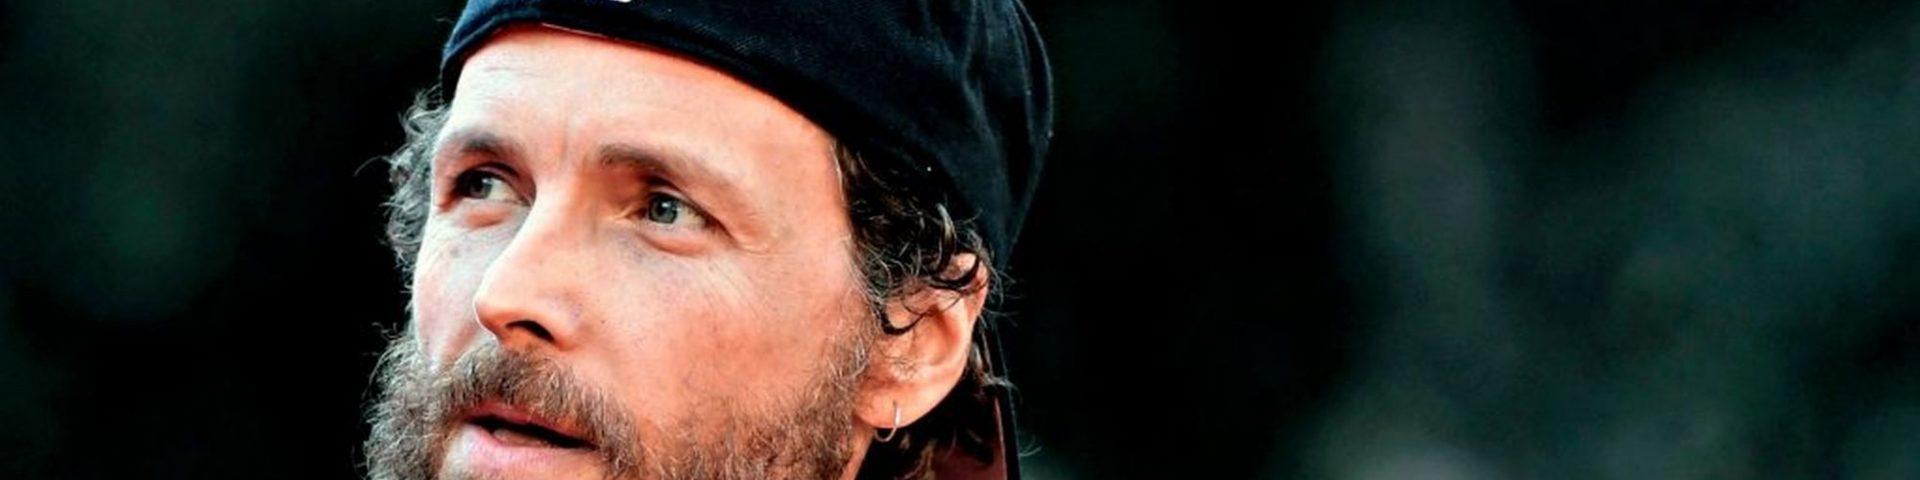 Tale e Quale Show 2018, Jovanotti e Tommaso Paradiso tra gli imitati